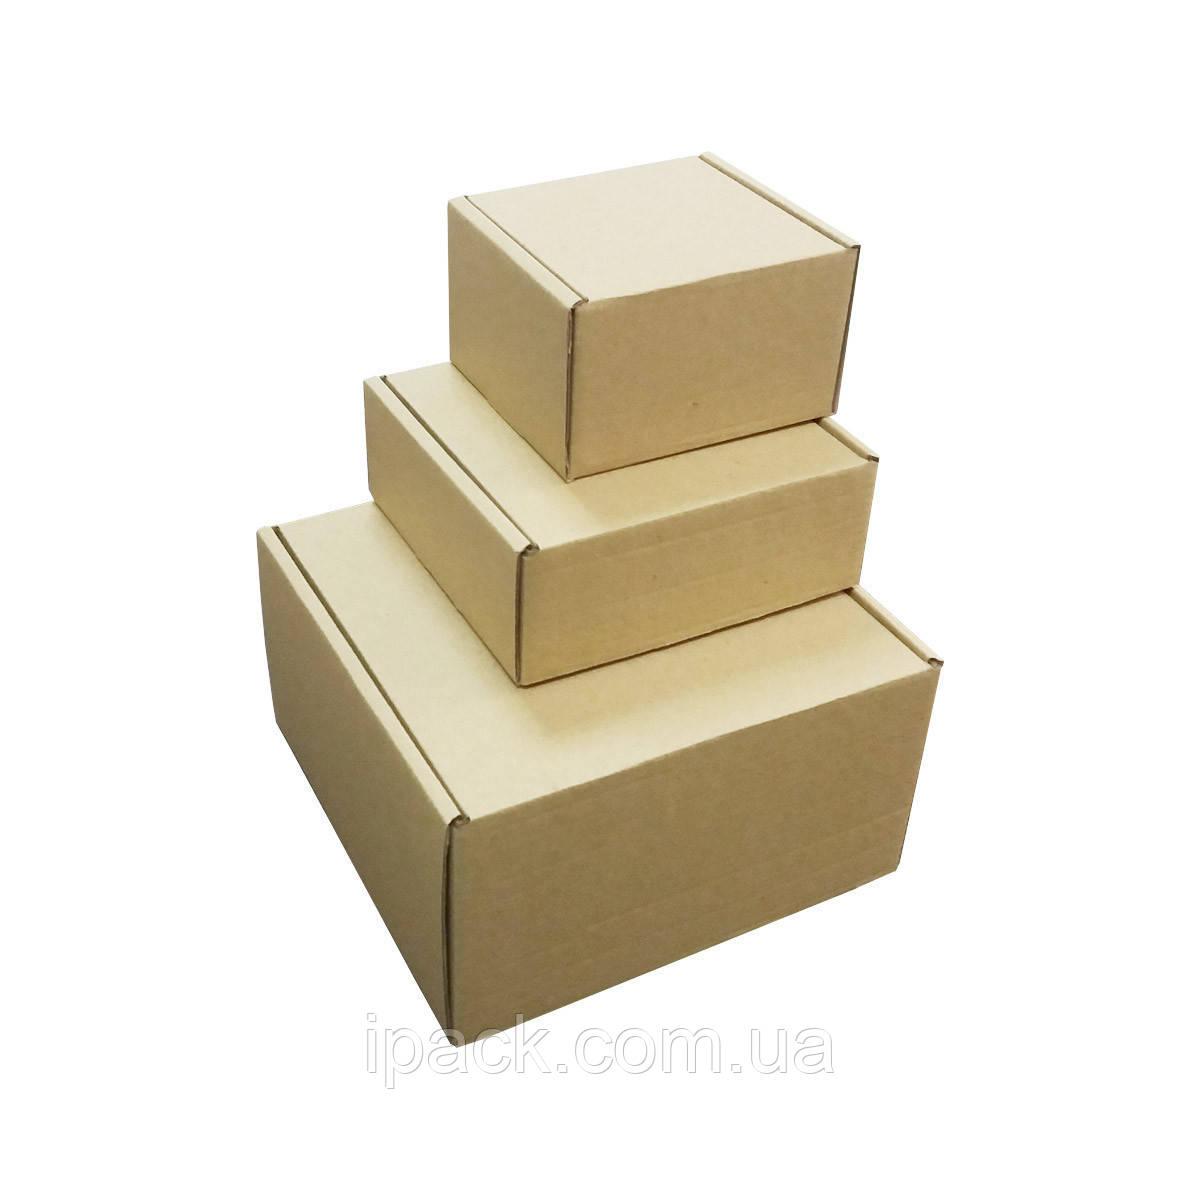 Коробка картонная самосборная, 400*300*400, мм, бурая, крафт, микрогофрокартон